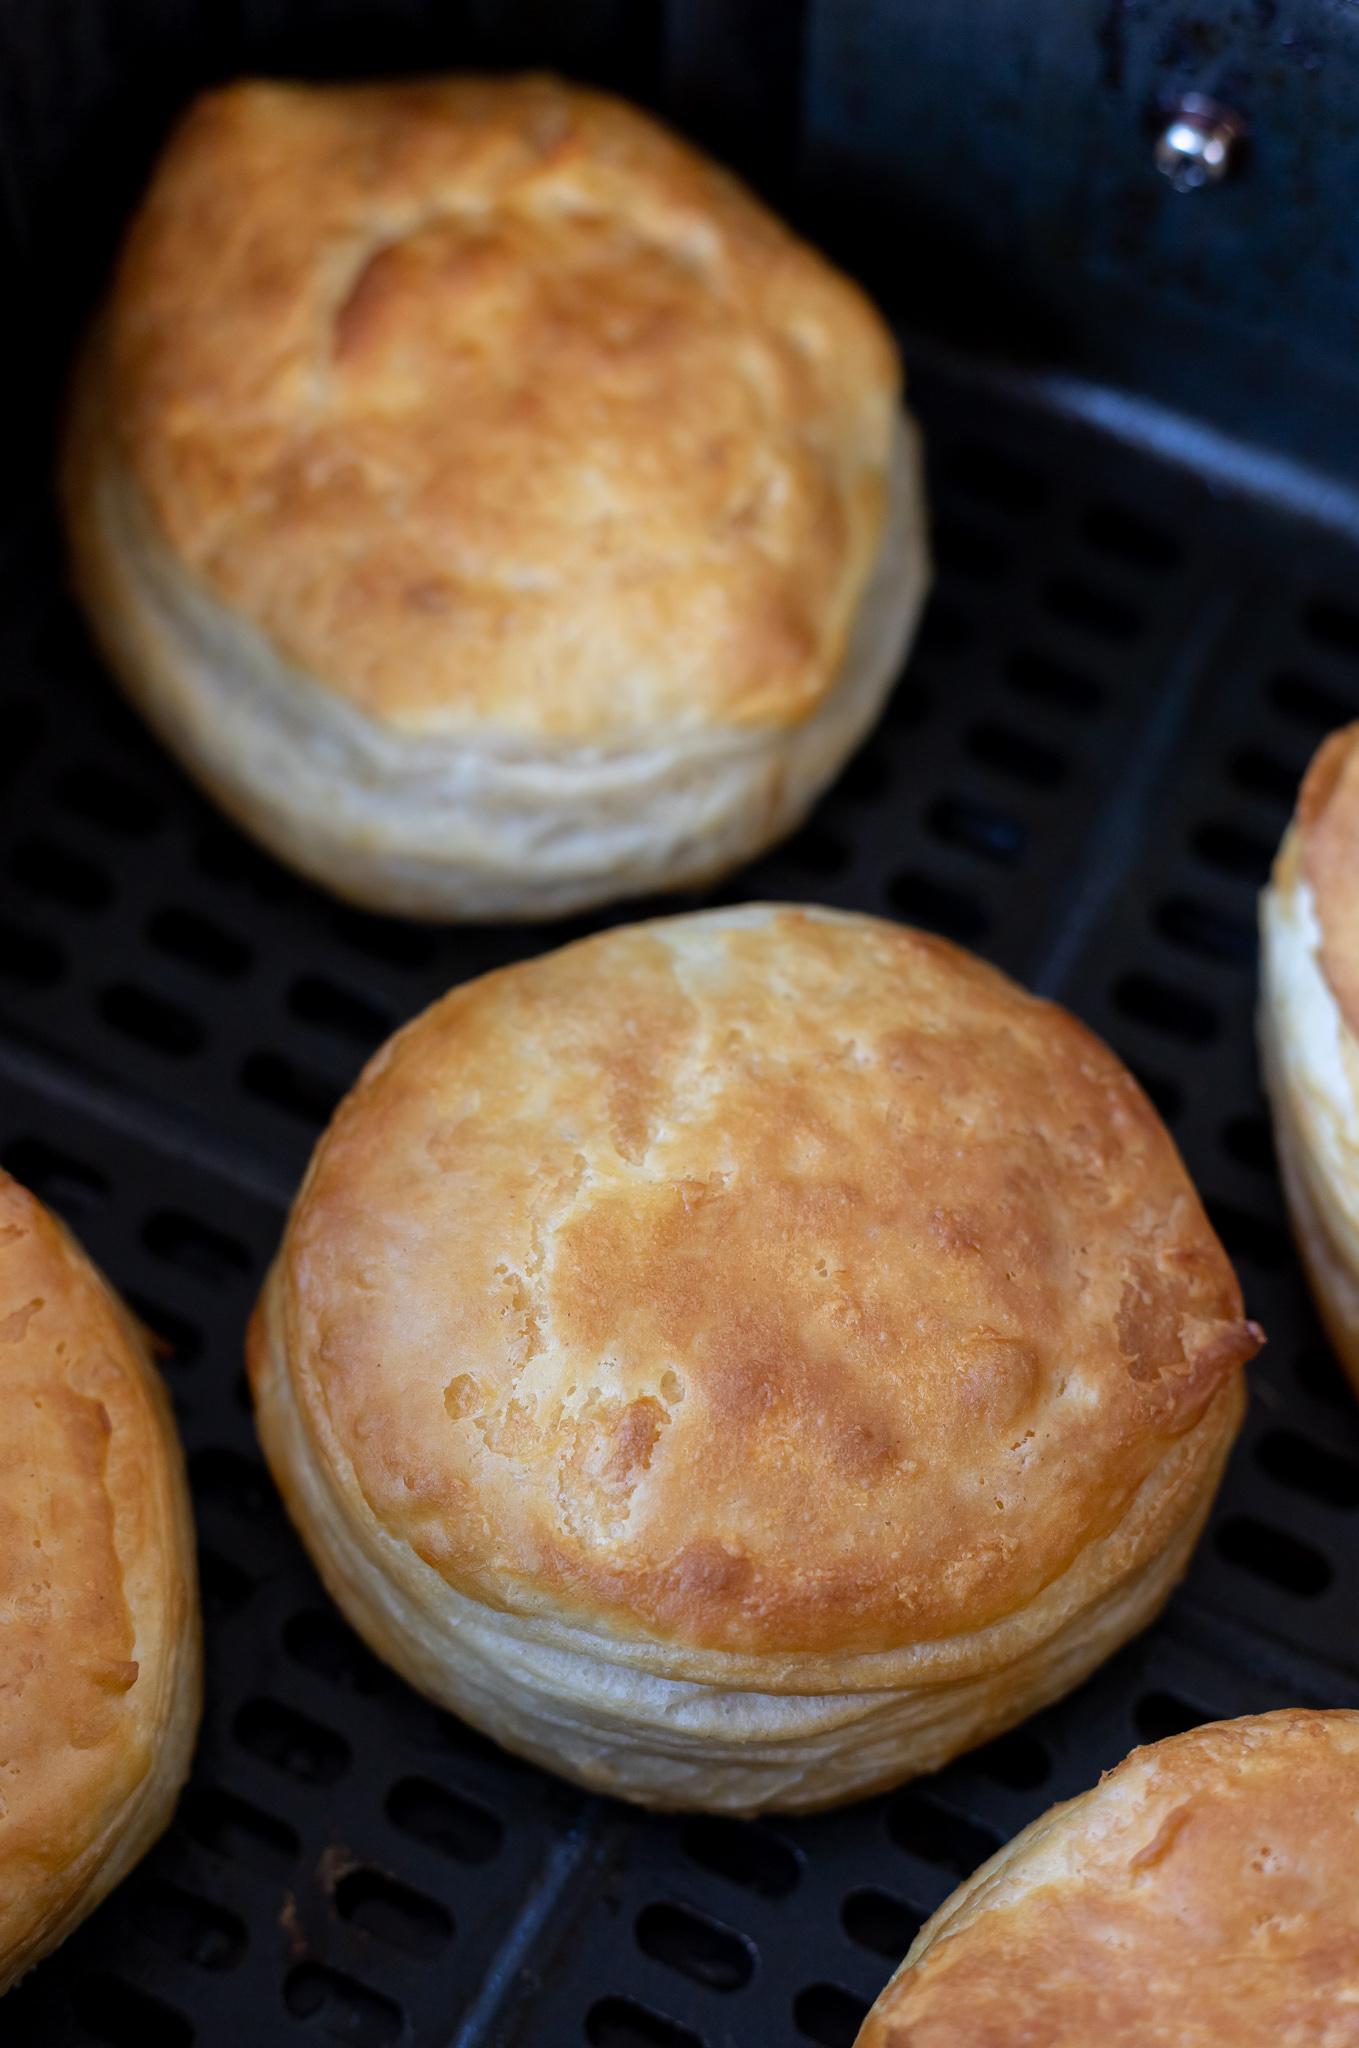 golden brown cooked biscuits